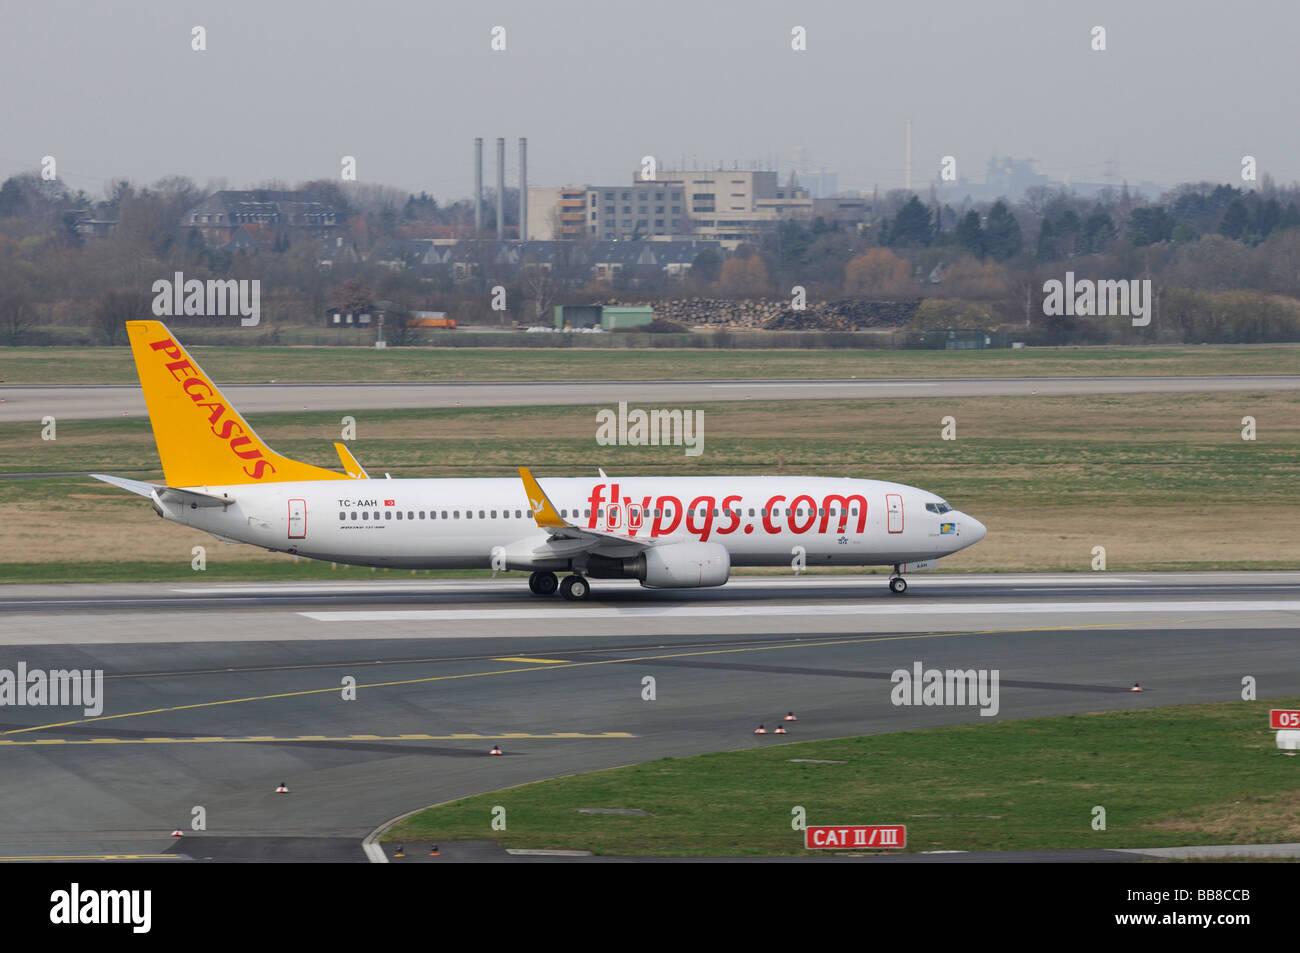 Pegasus Boeing 737-800 on the runway, flypgs.com, Turkish airline, Duesseldorf International Airport, North Rhine - Stock Image